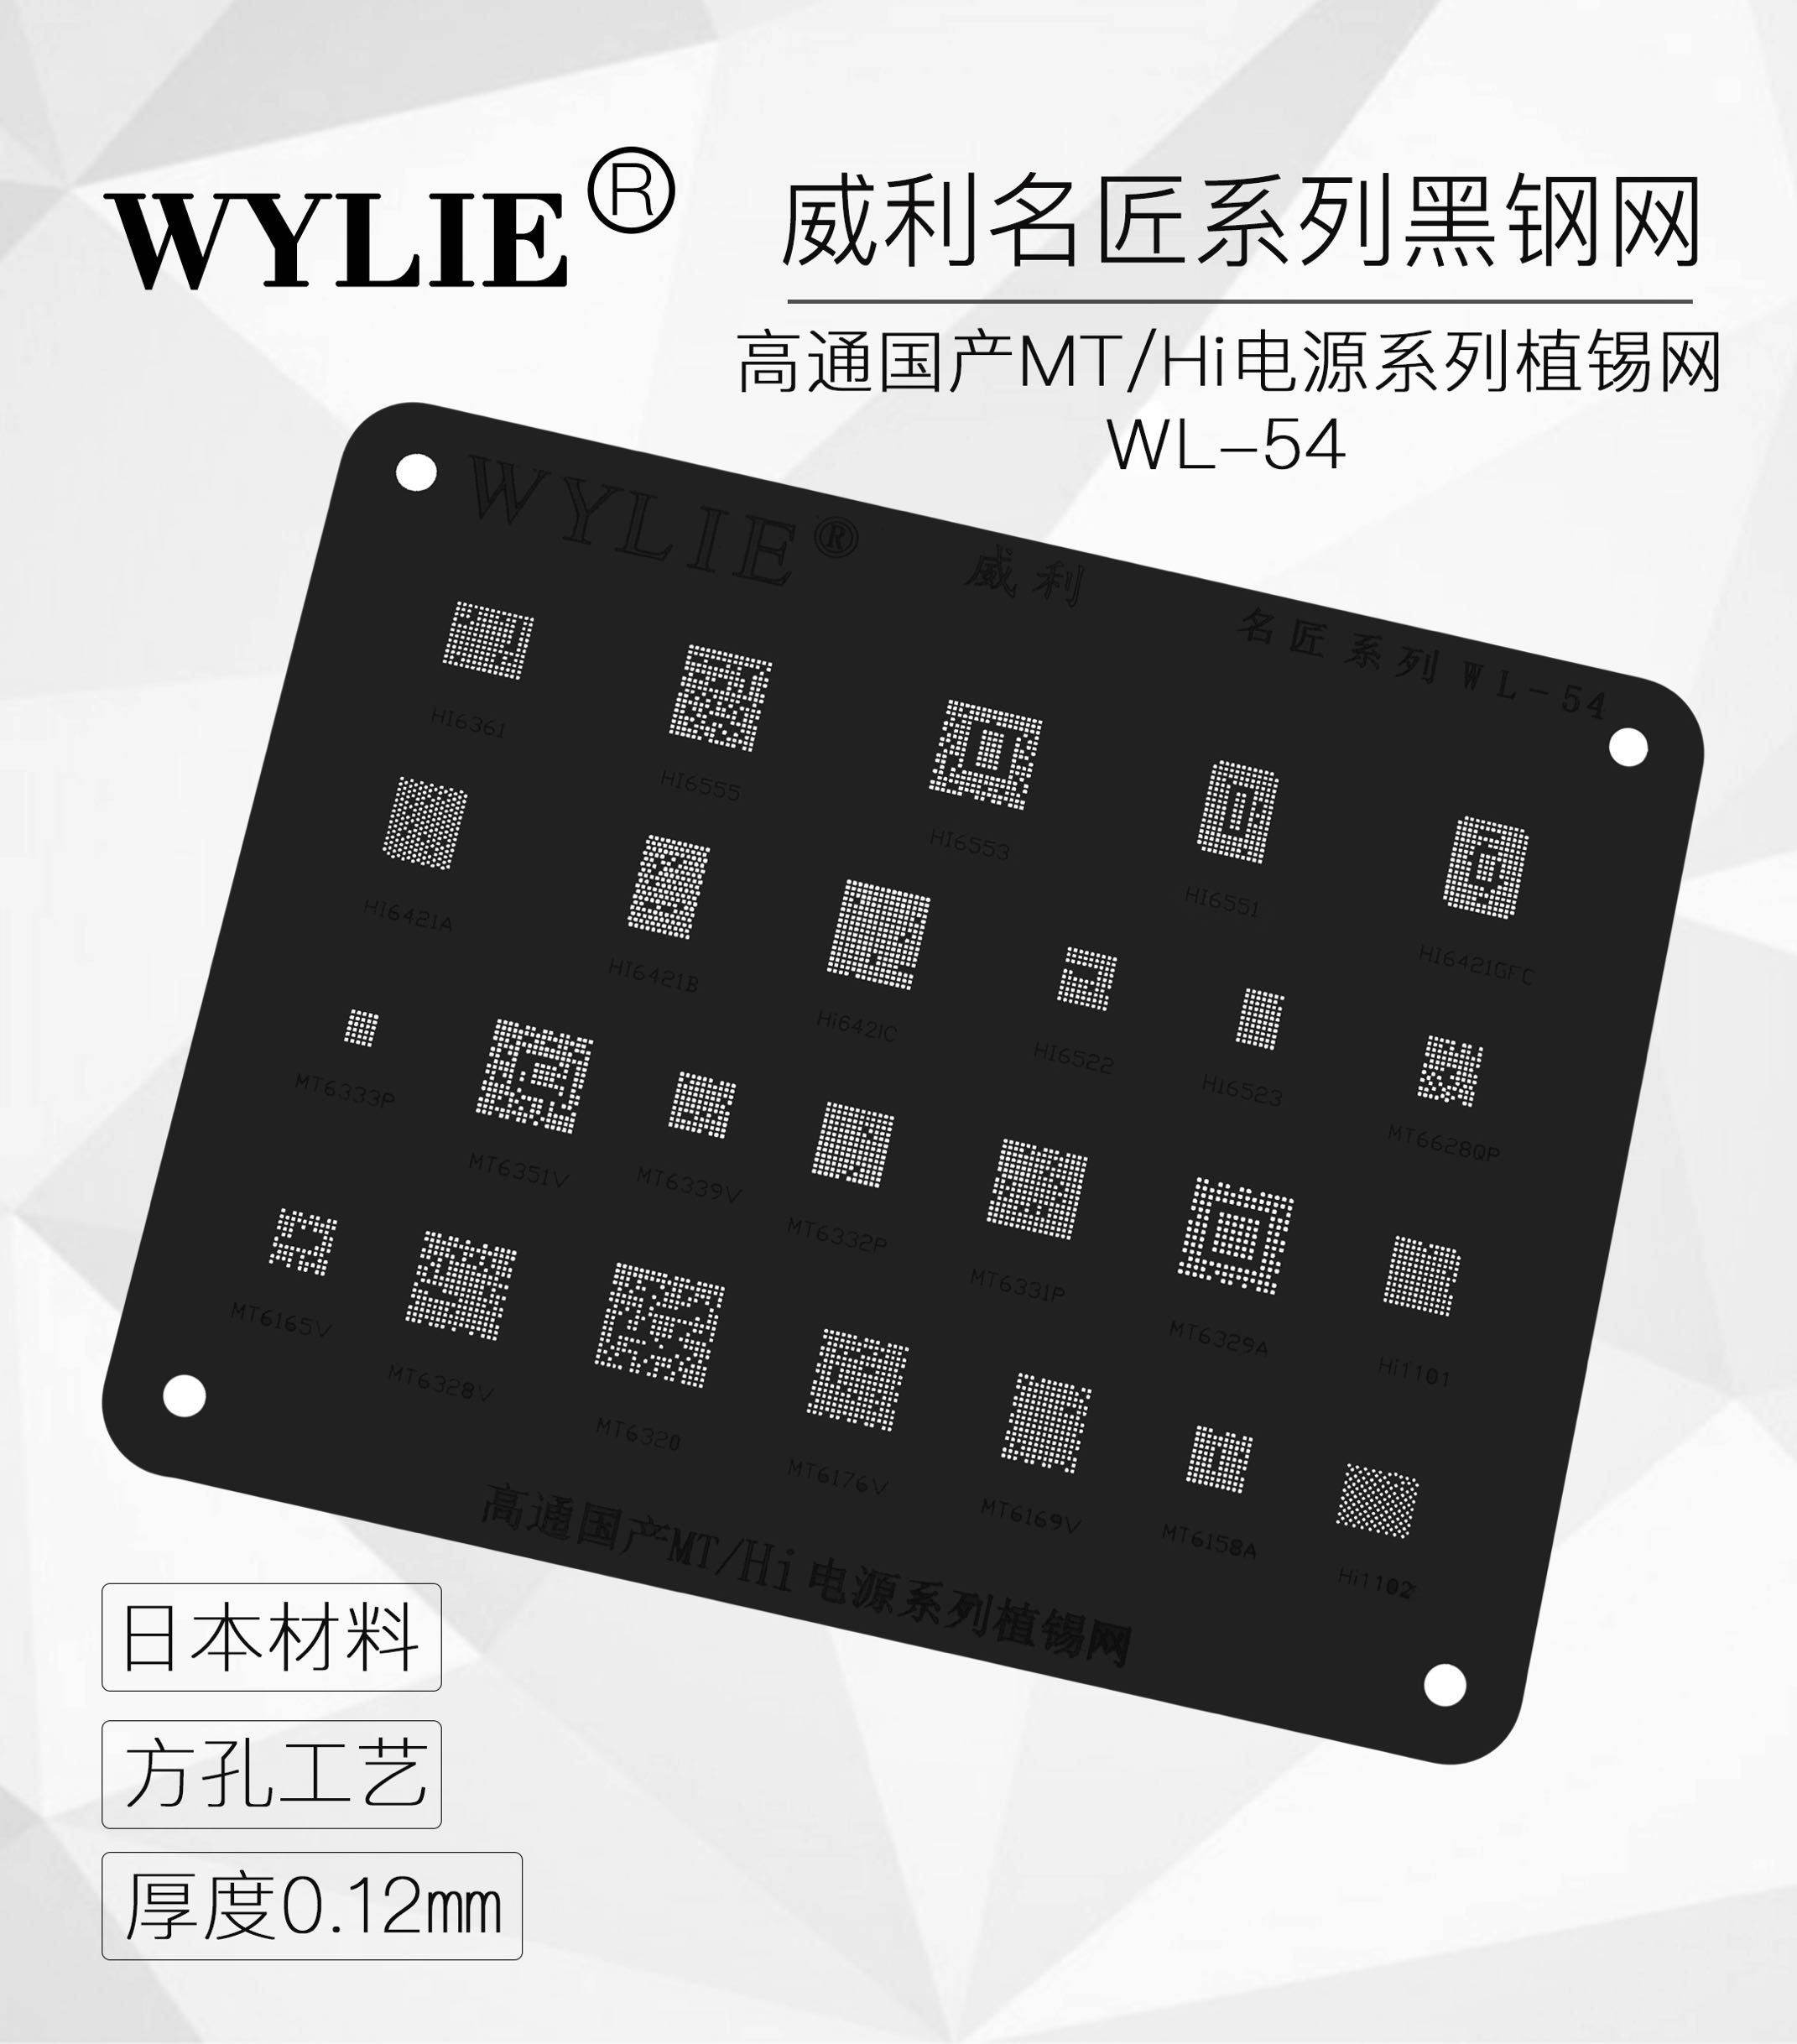 Wylie BGA Reballing Stencil for HI1102 MT6158A MT6169V MT6328V MT6320 MT6165V MT6333P Power WiFi IC Chip 1